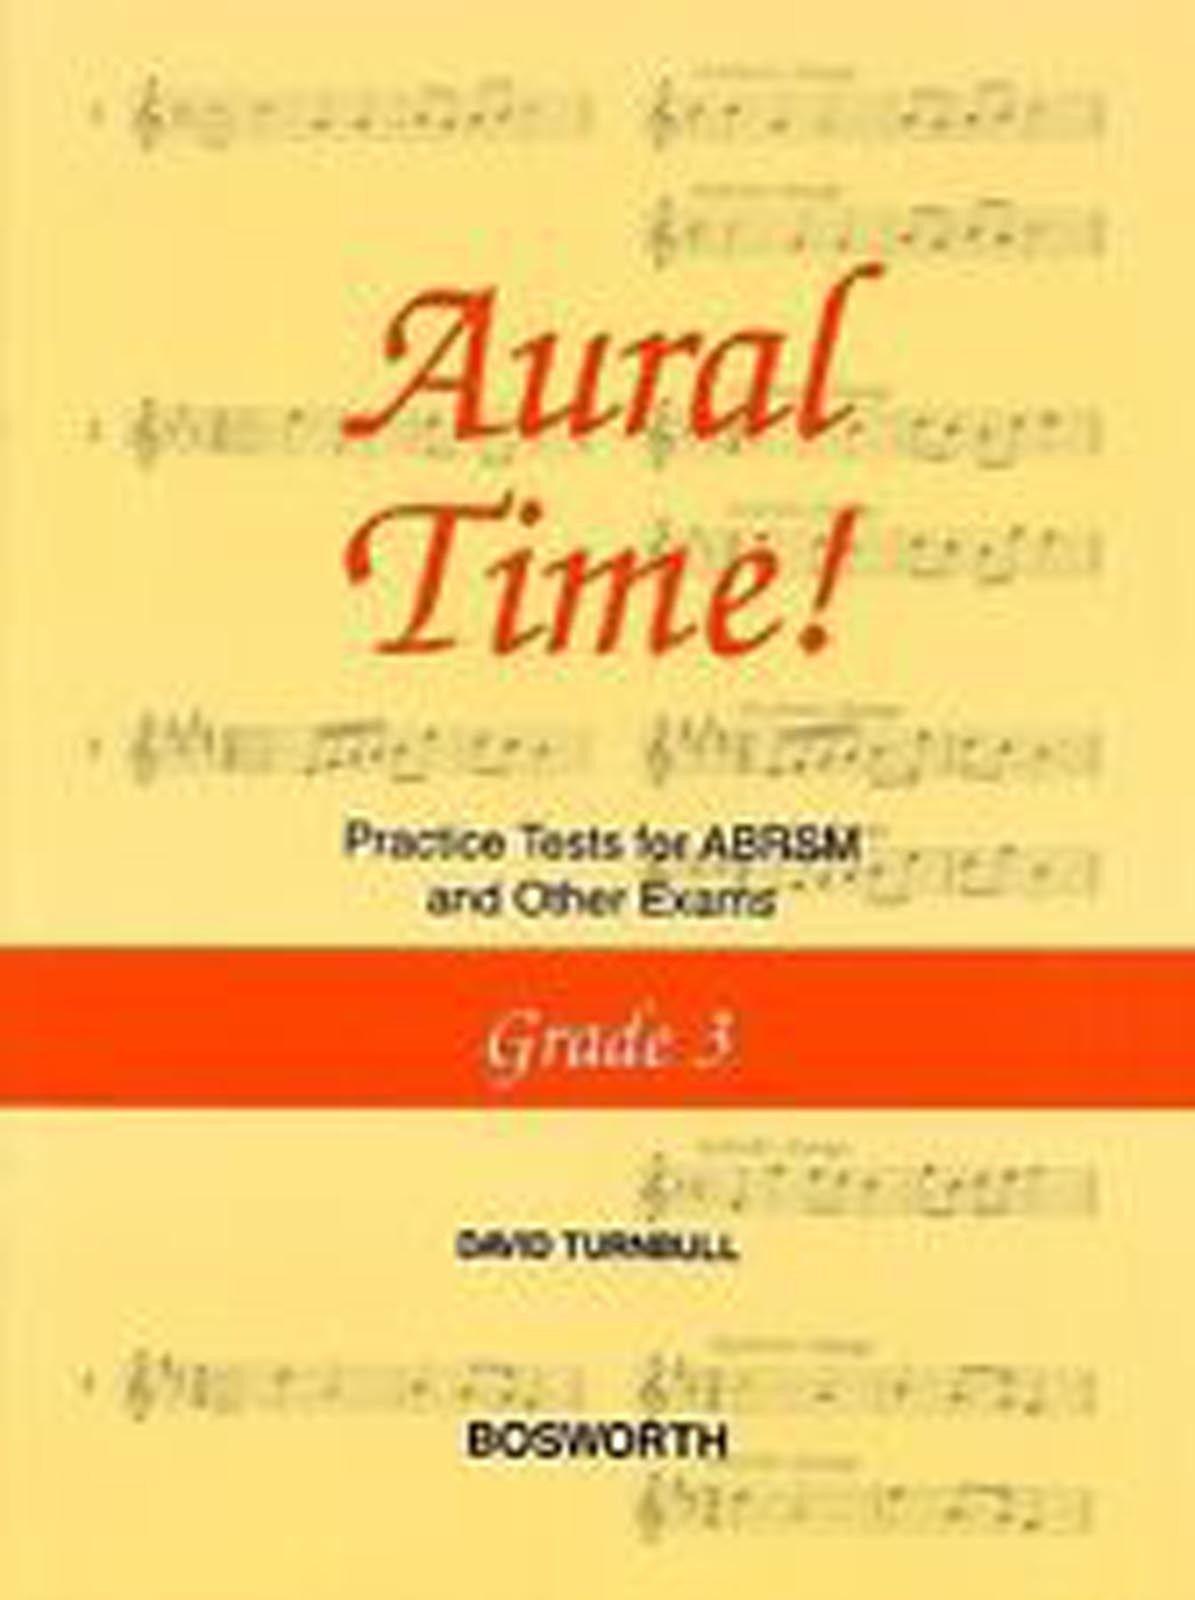 David Turnbull Aural Time! Practice Tests ABRSM Grade 3 Book Bosworth B44 S78